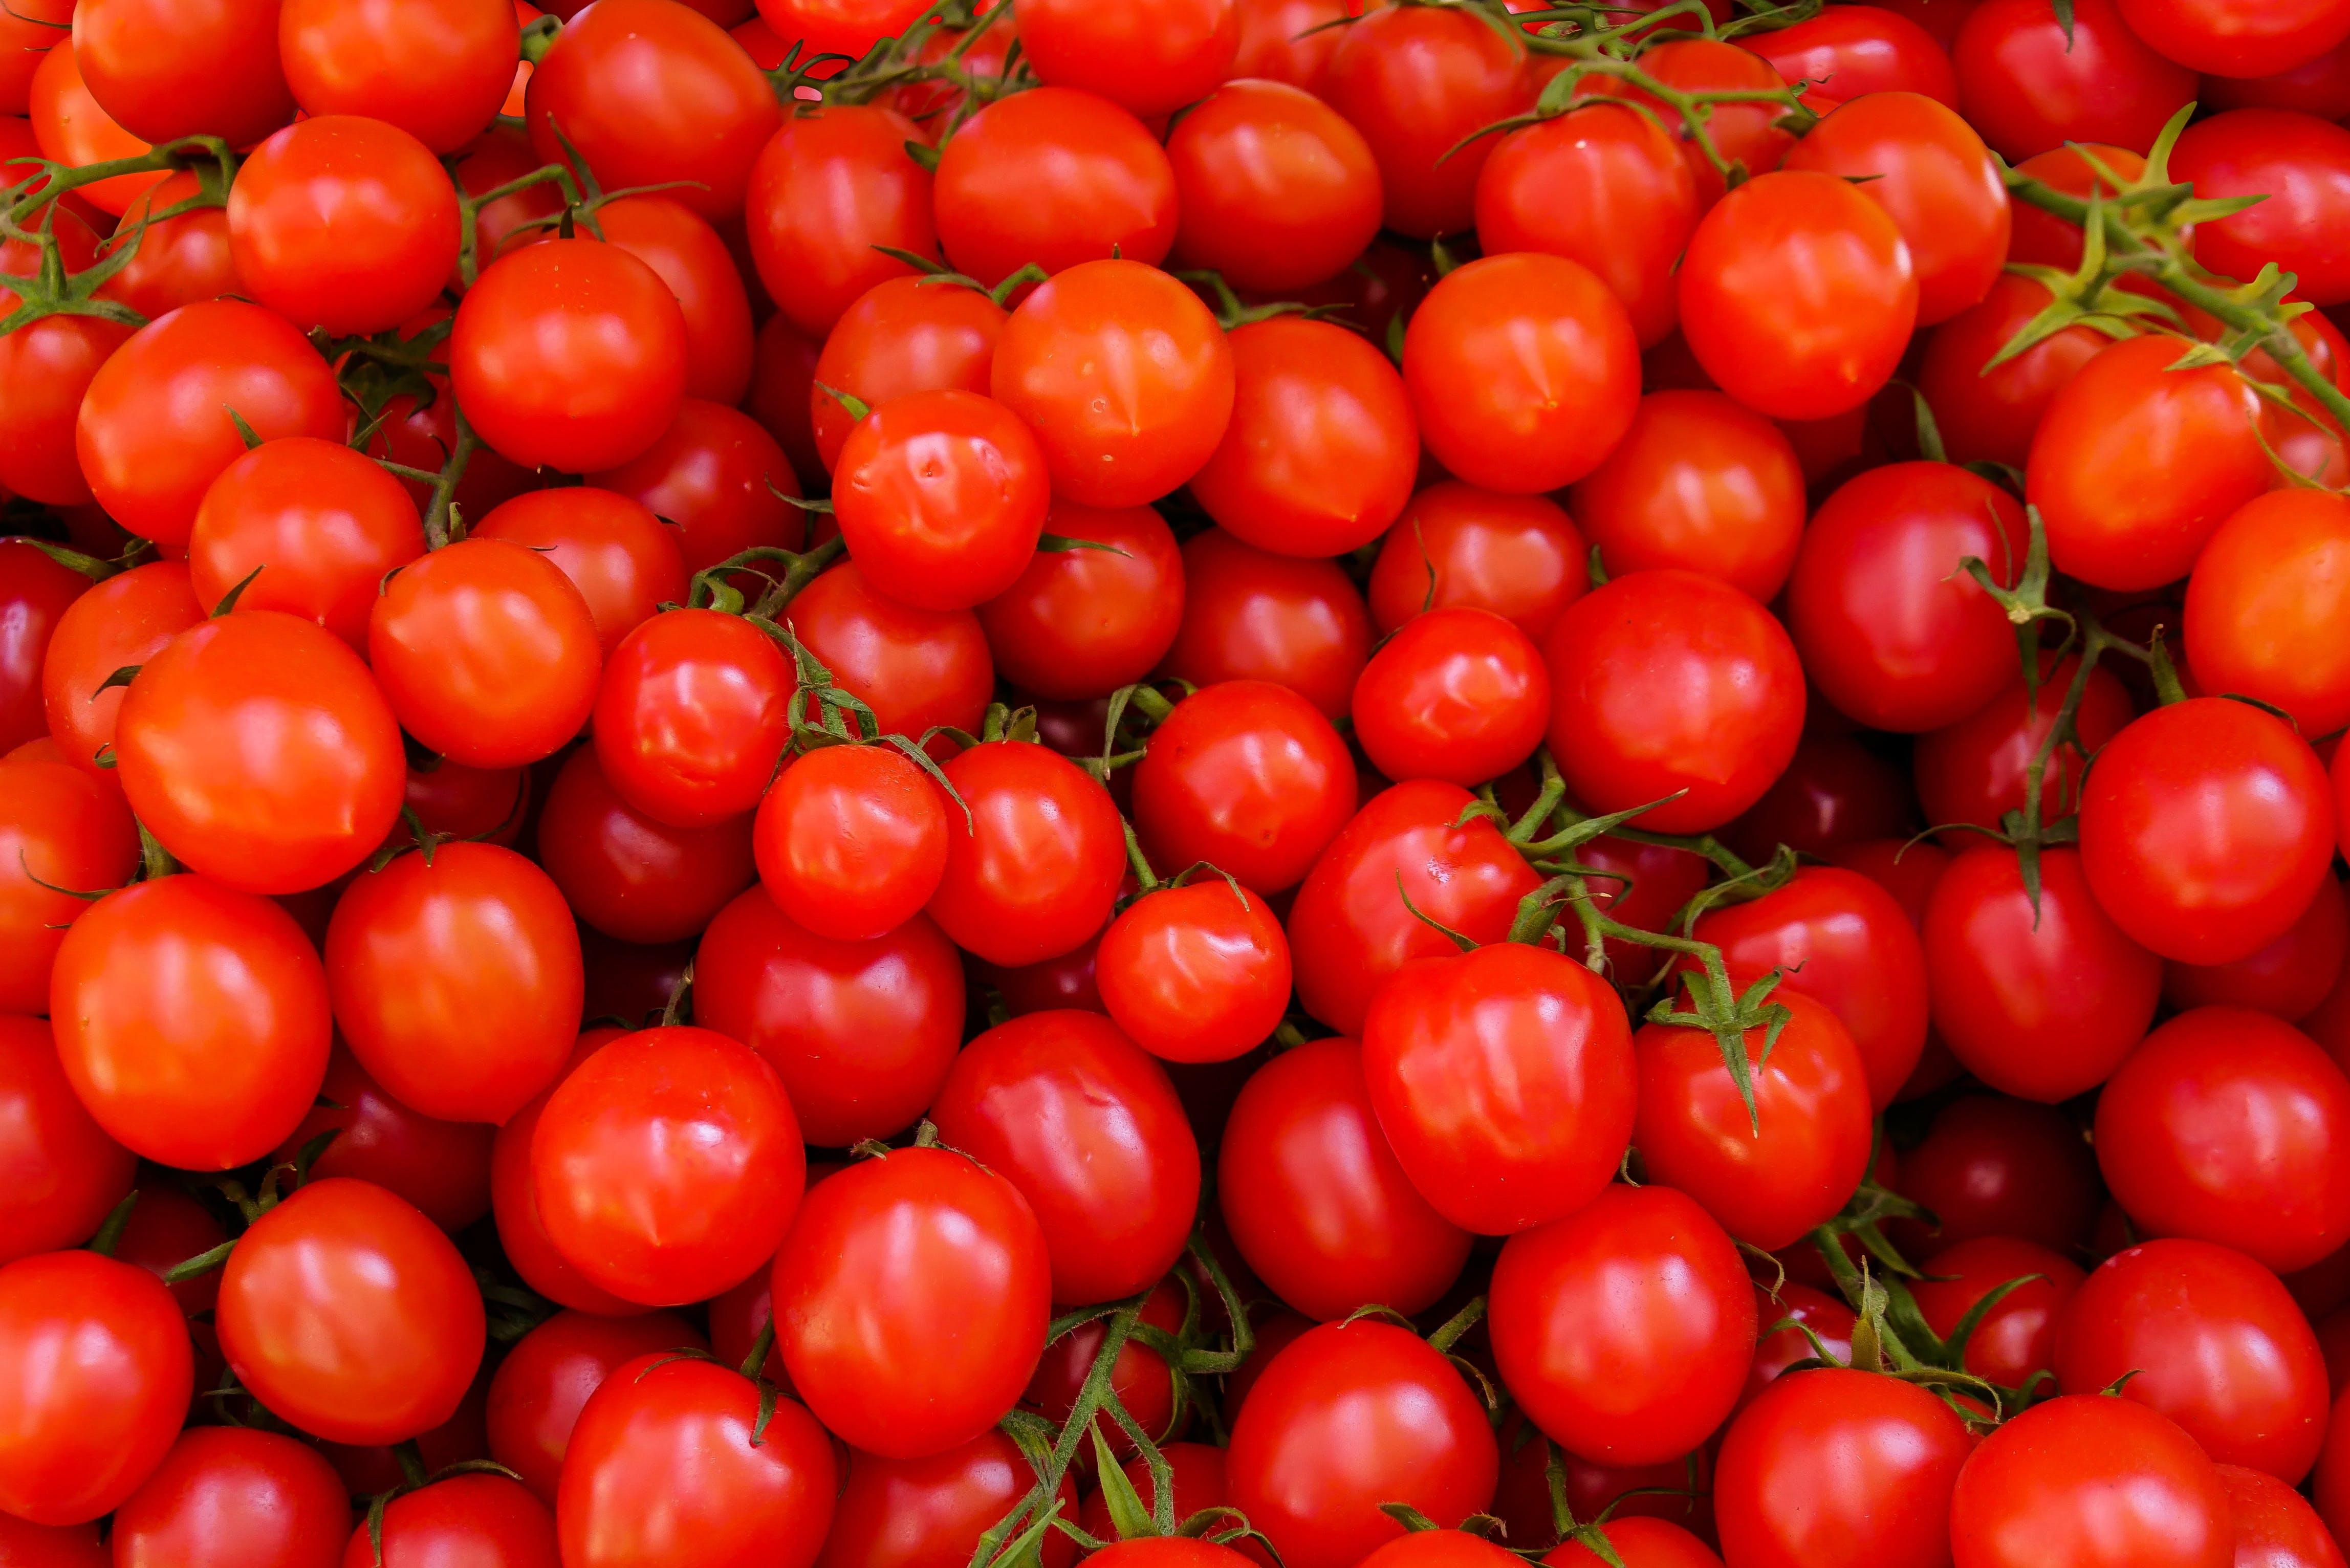 abundance, agriculture, fresh